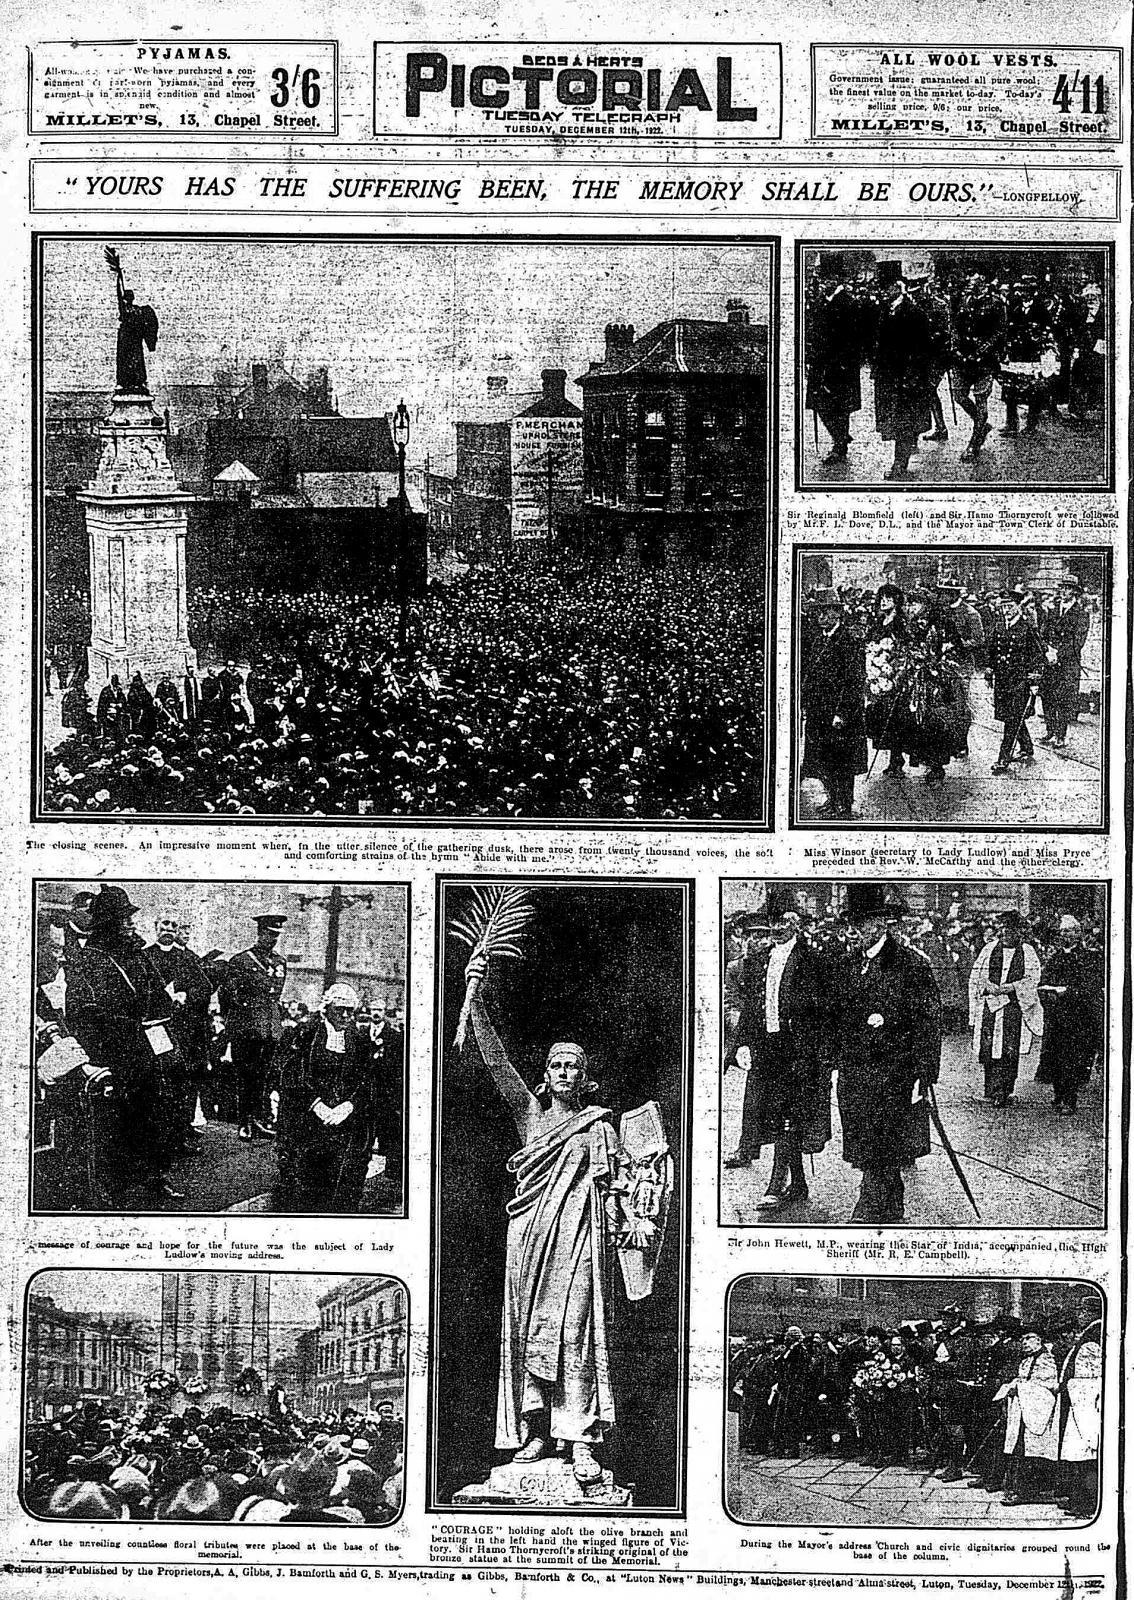 Scenes at the war memorial unveiling